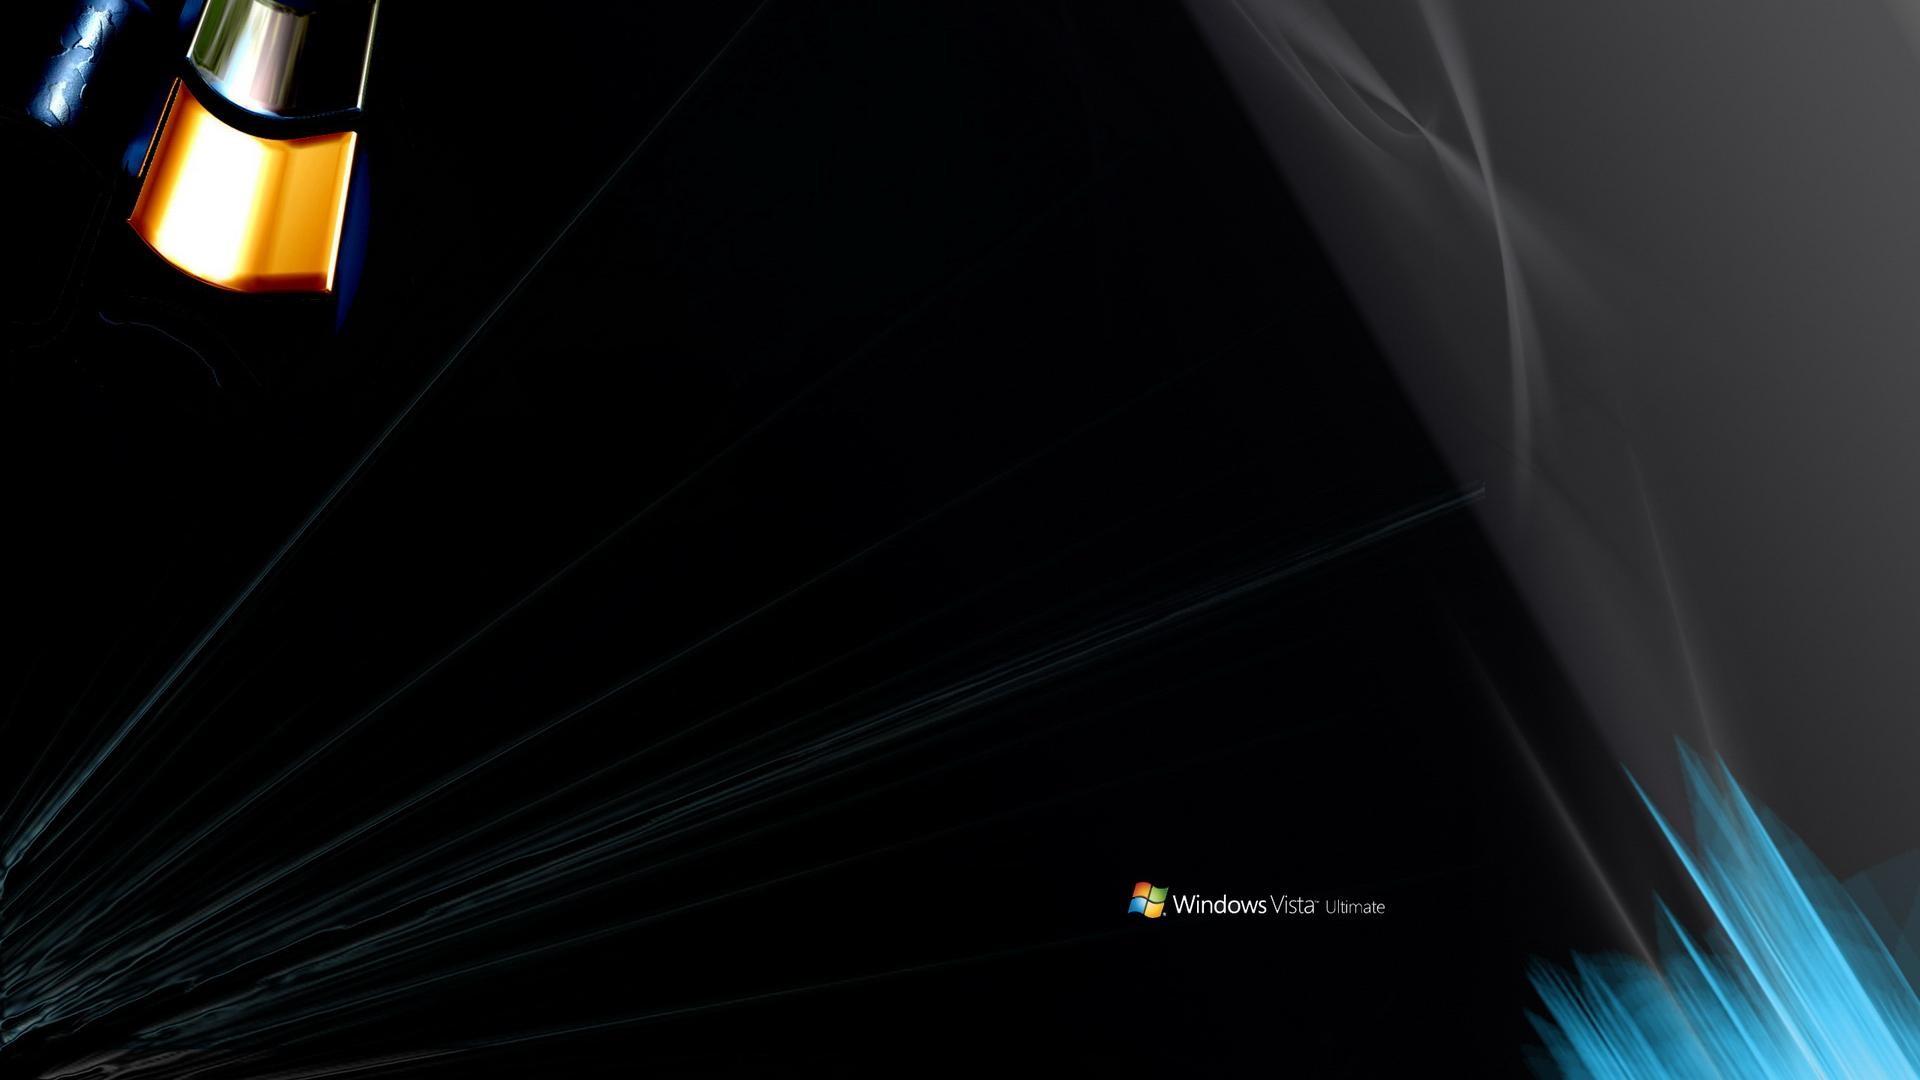 Res: 1920x1080,  Windows vista ultimate desktop backgrounds wide wallpapers:1280x800,1440x900,1680x1050  - hd